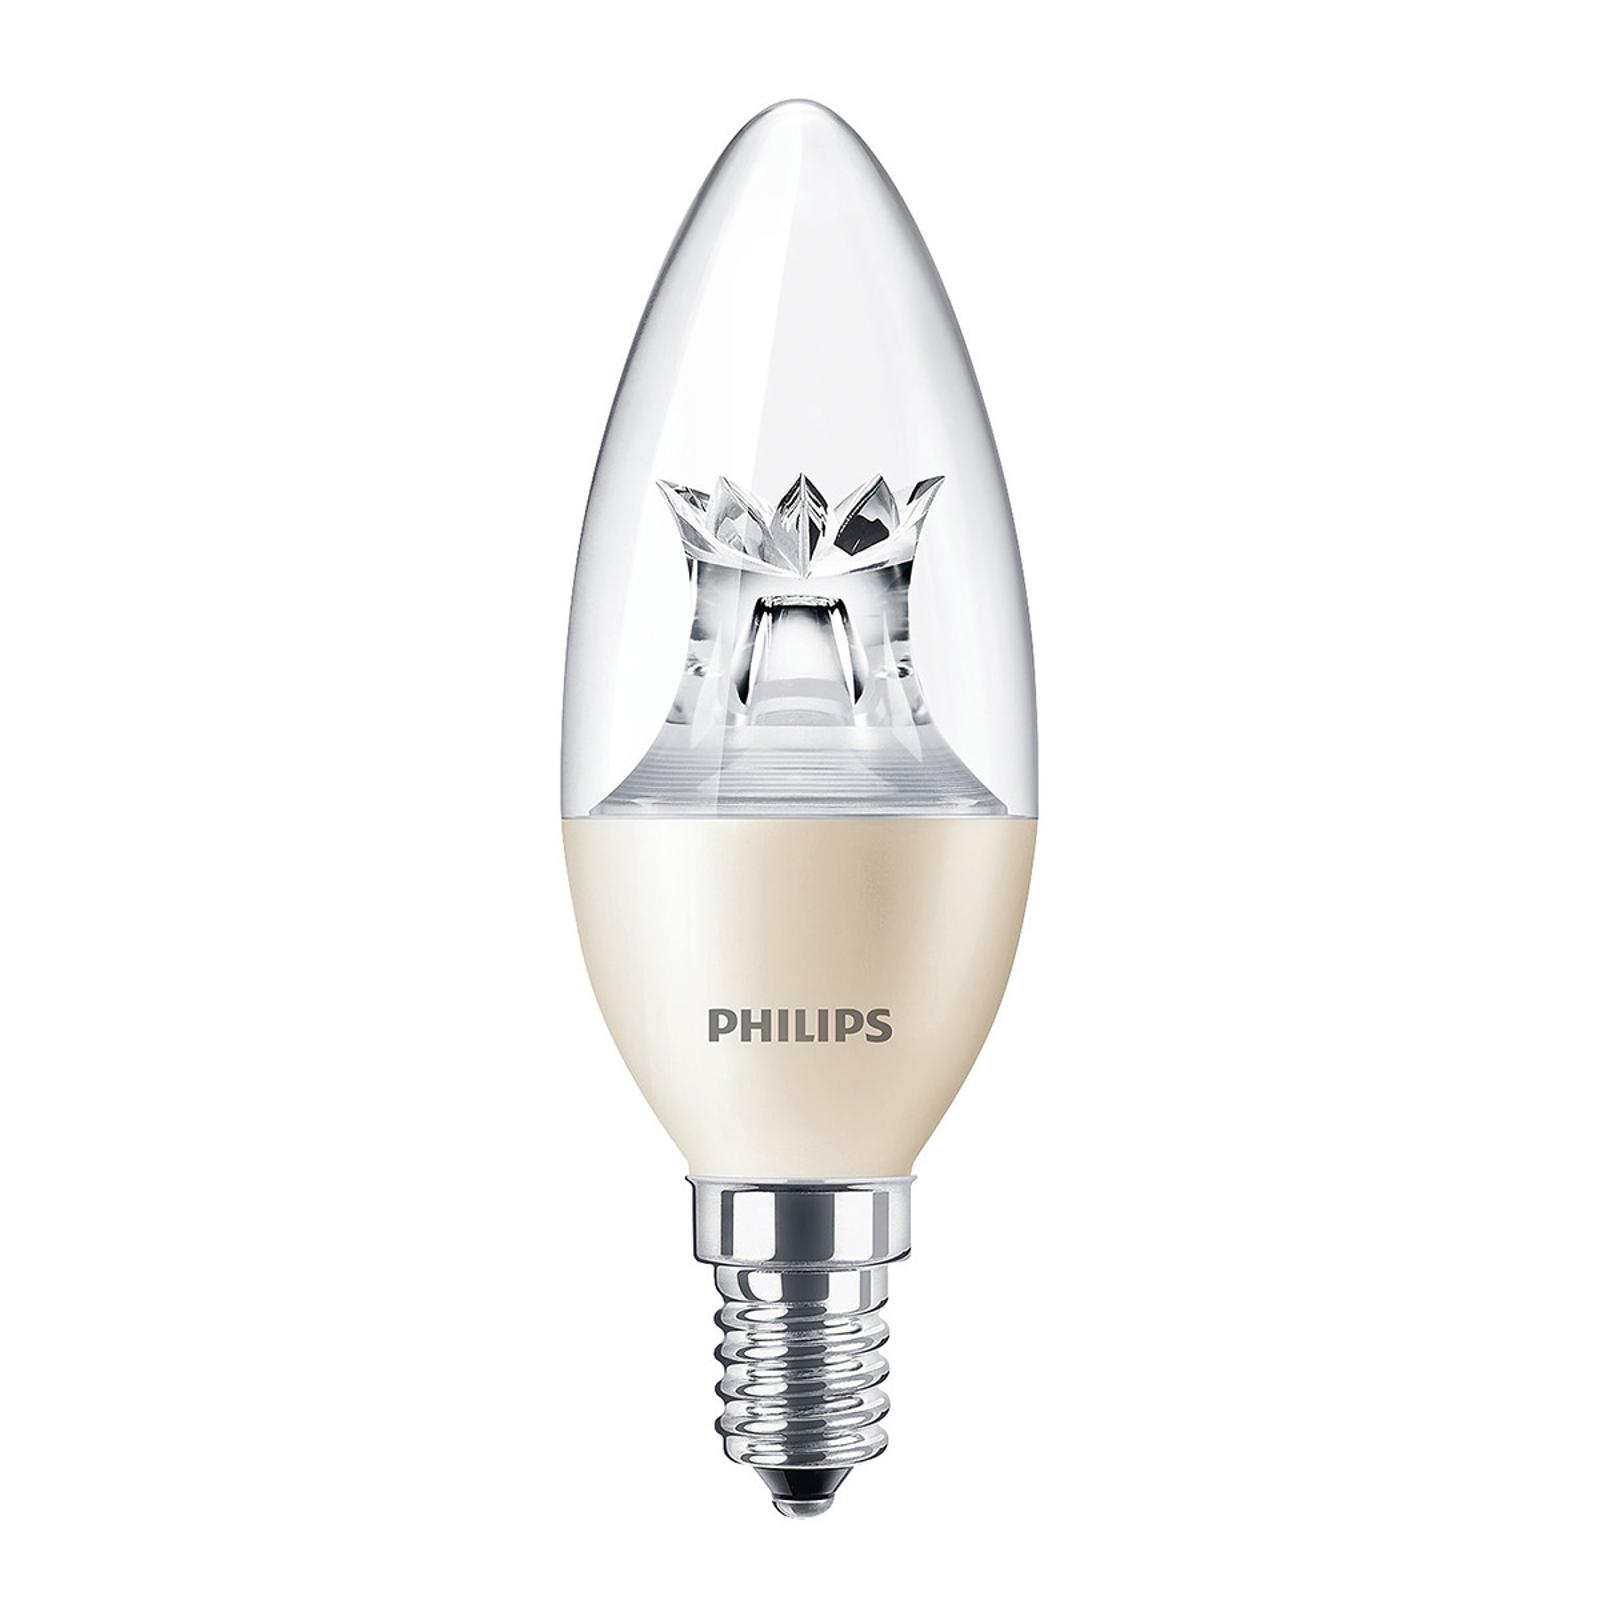 LED-kynttilälamppu E14 6W Candle DT CL DimTone